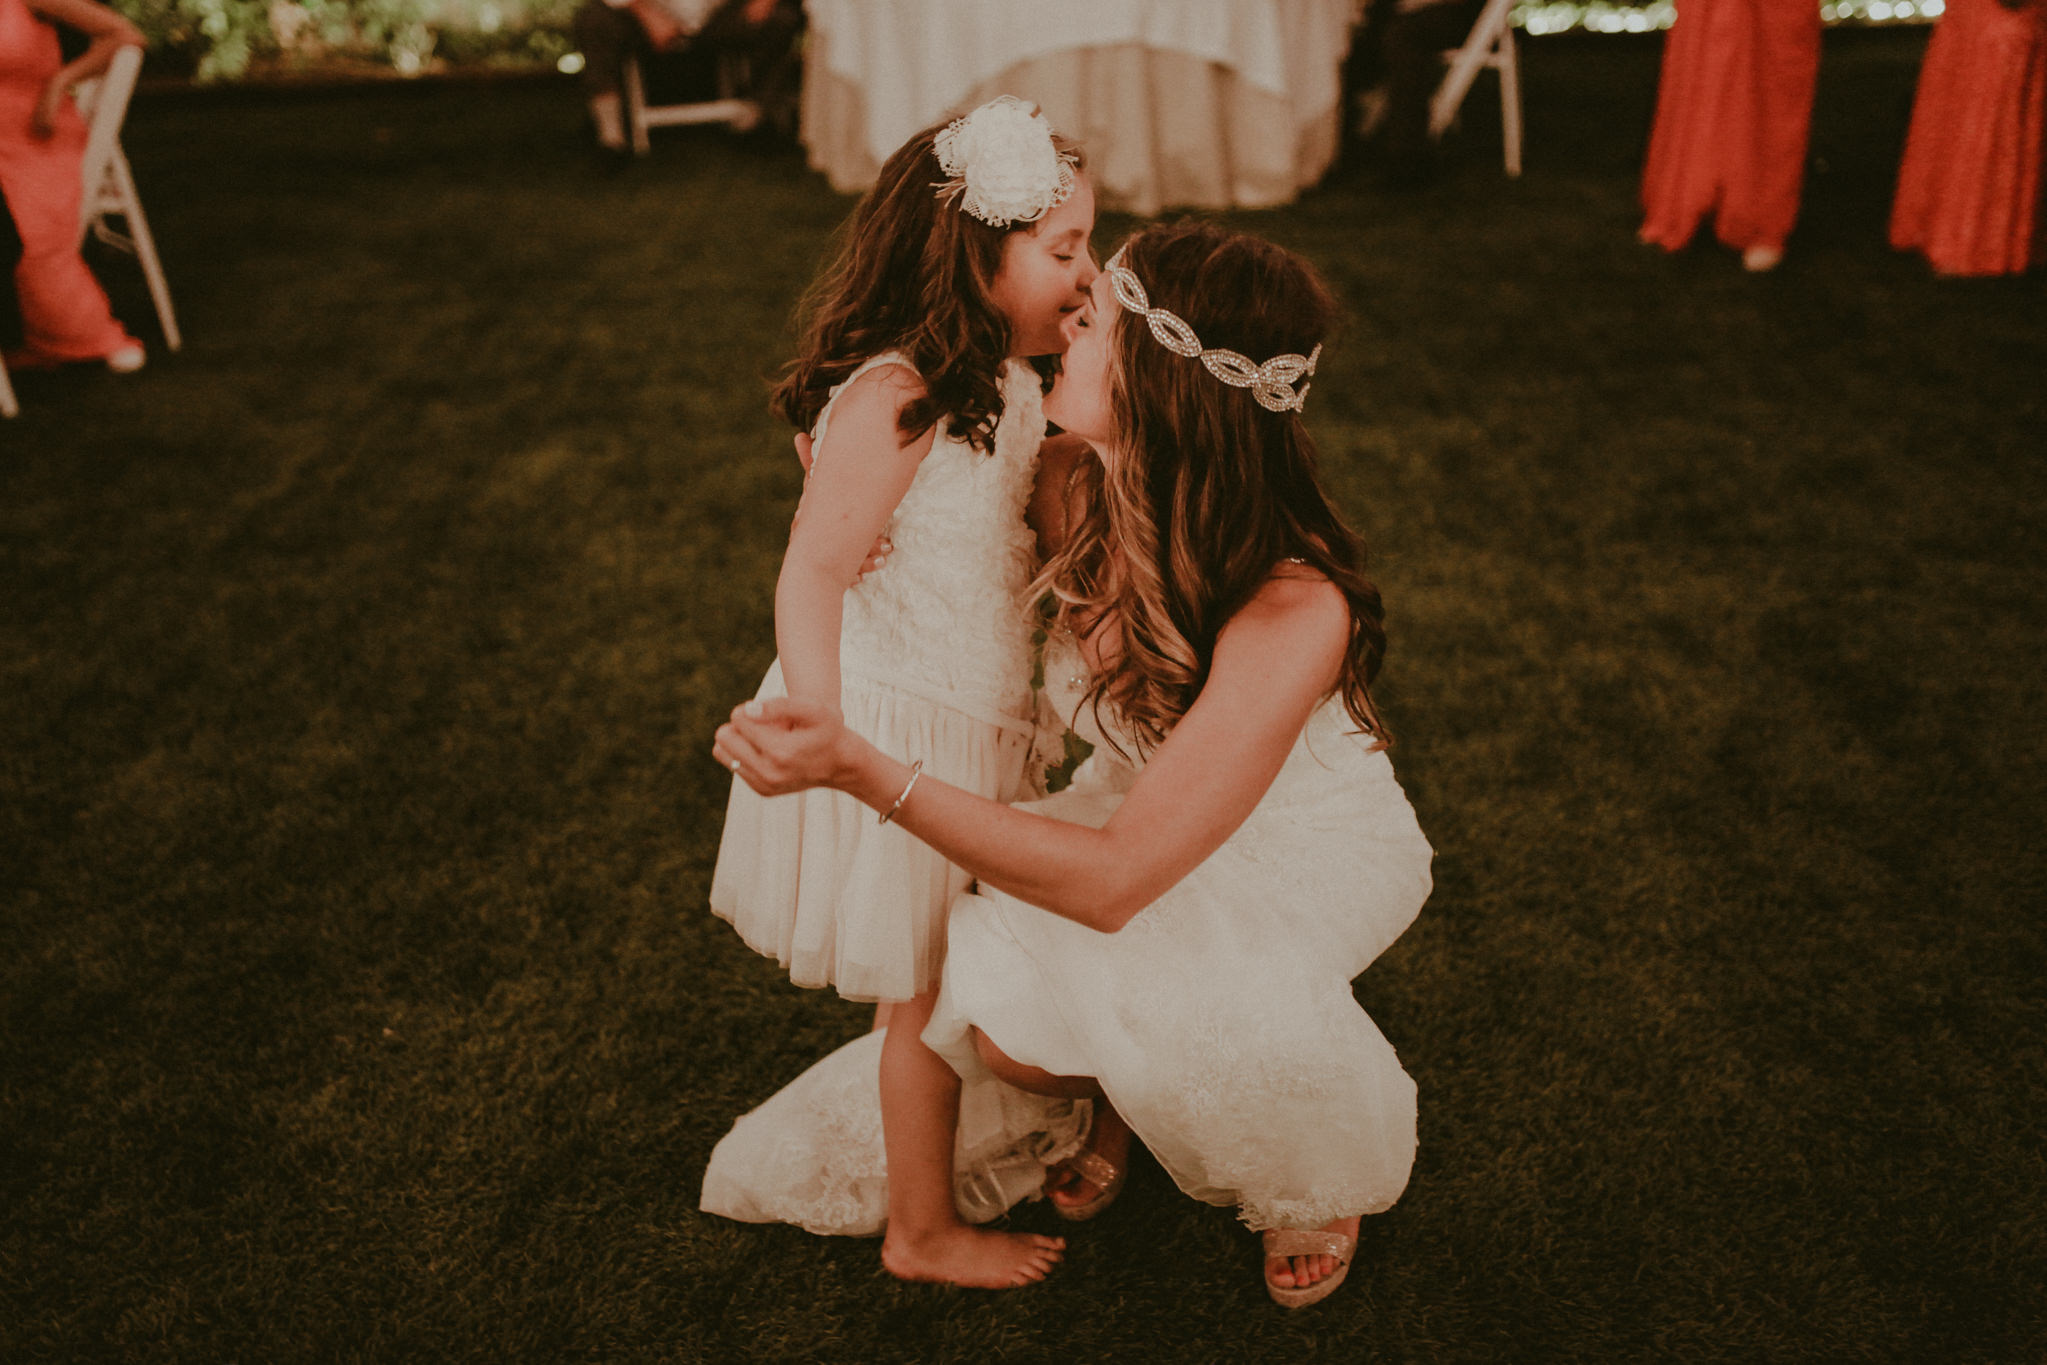 boda-diferente-fotografo-boda-laspalmas-grancanaria-86